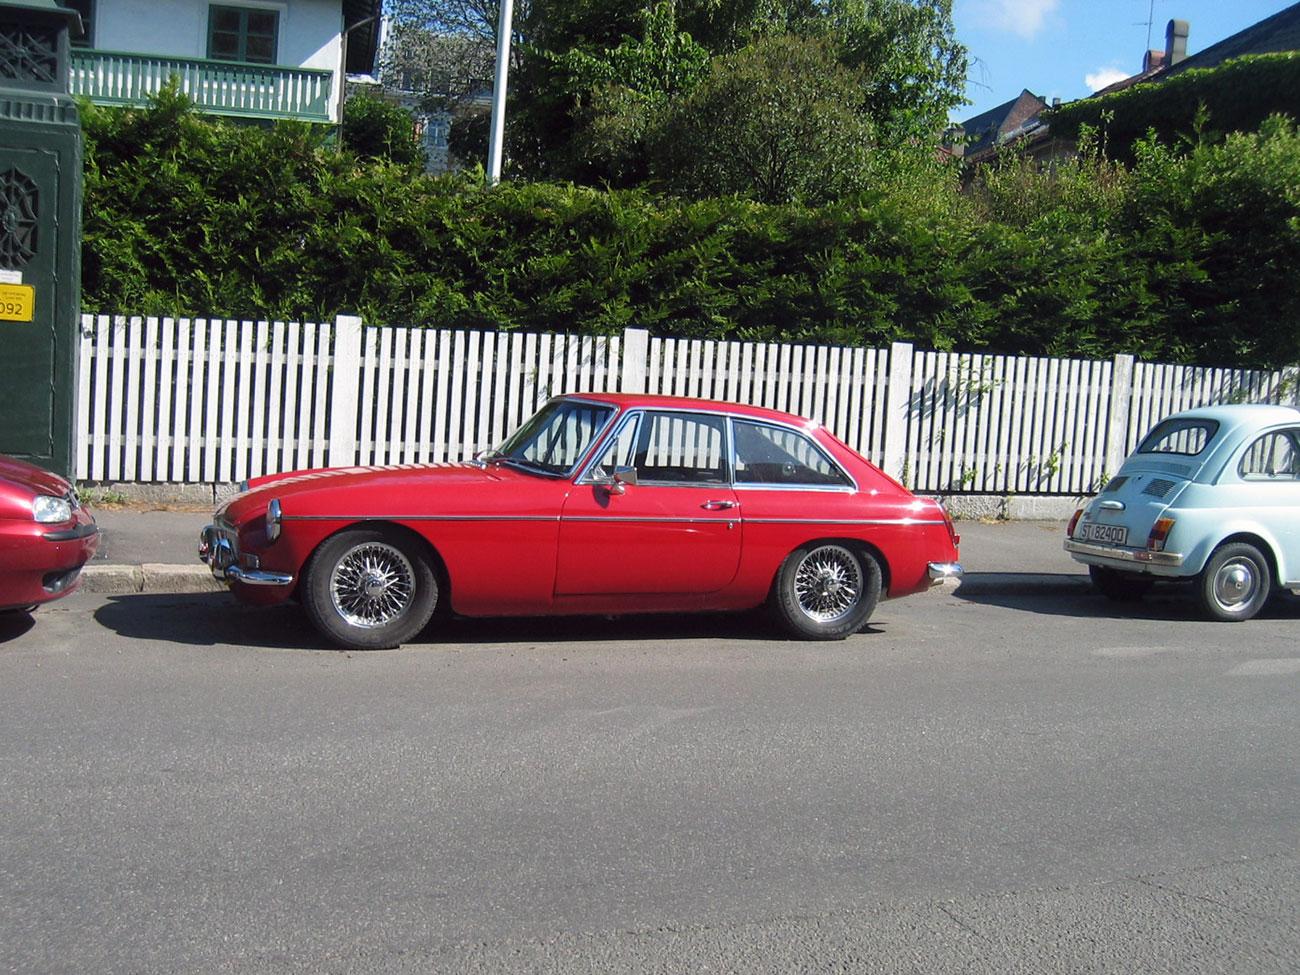 1969 MG MGB GT Pininfarina coupe